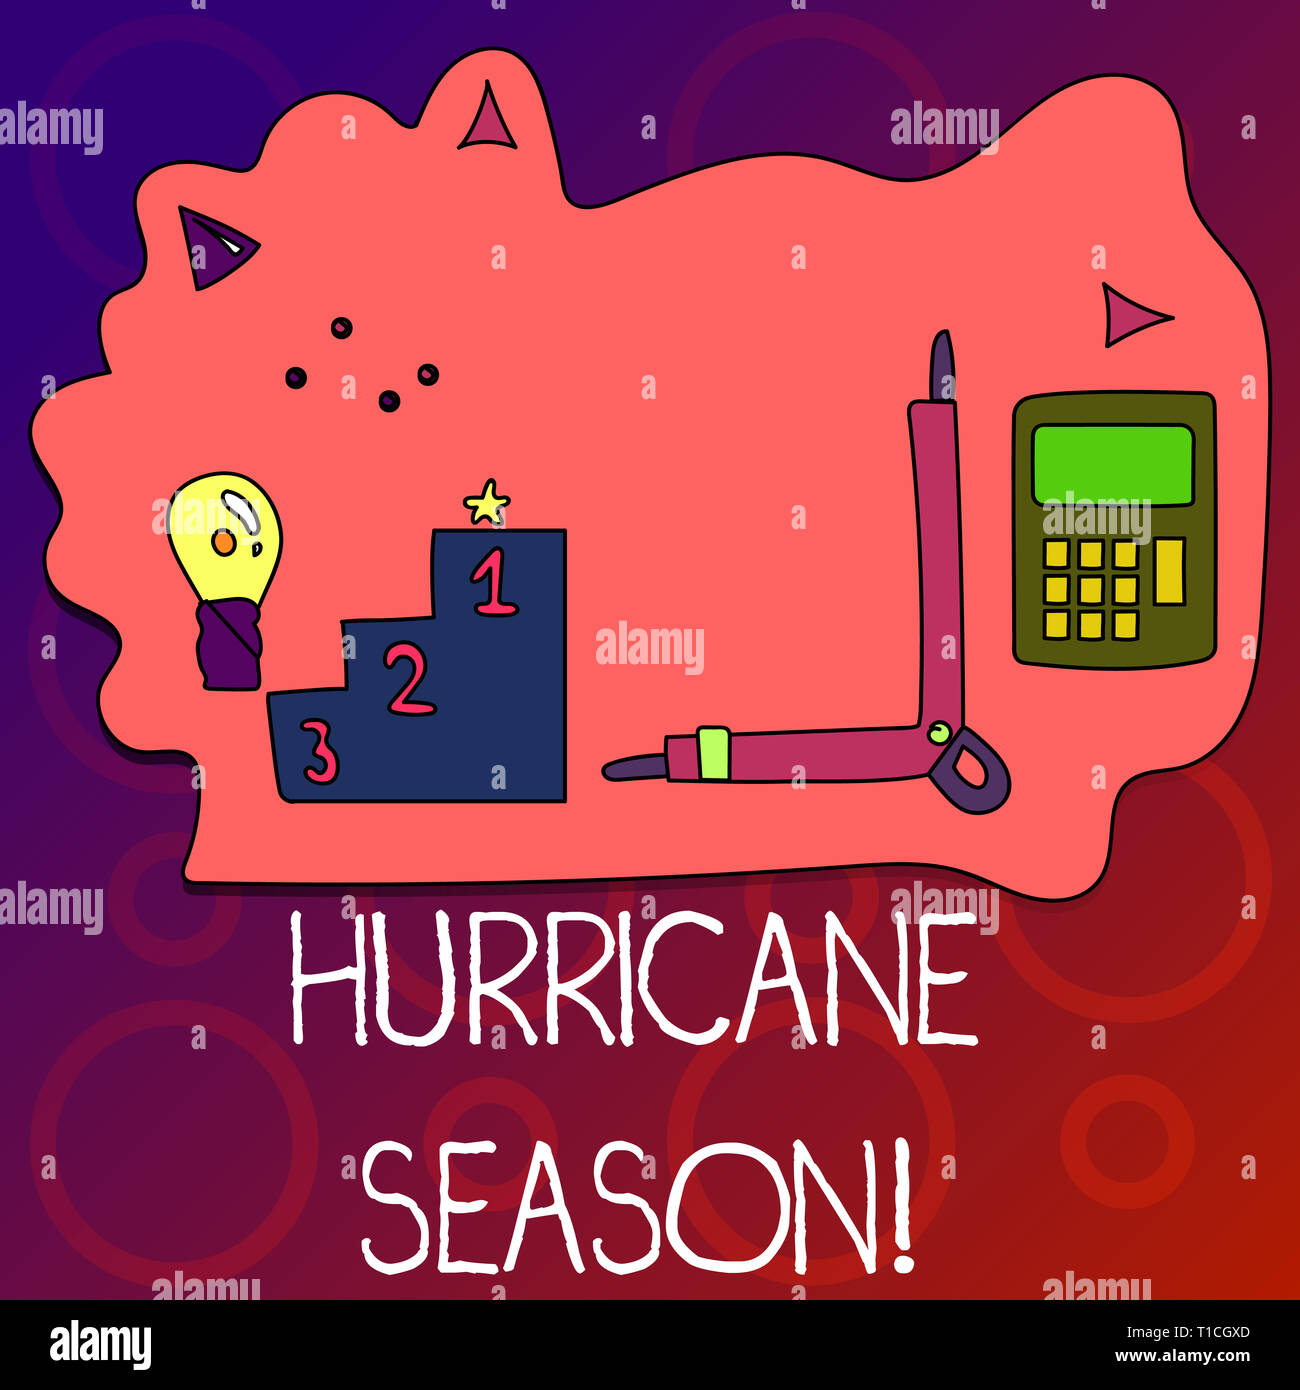 Hurricane Icons Stock Photos & Hurricane Icons Stock Images